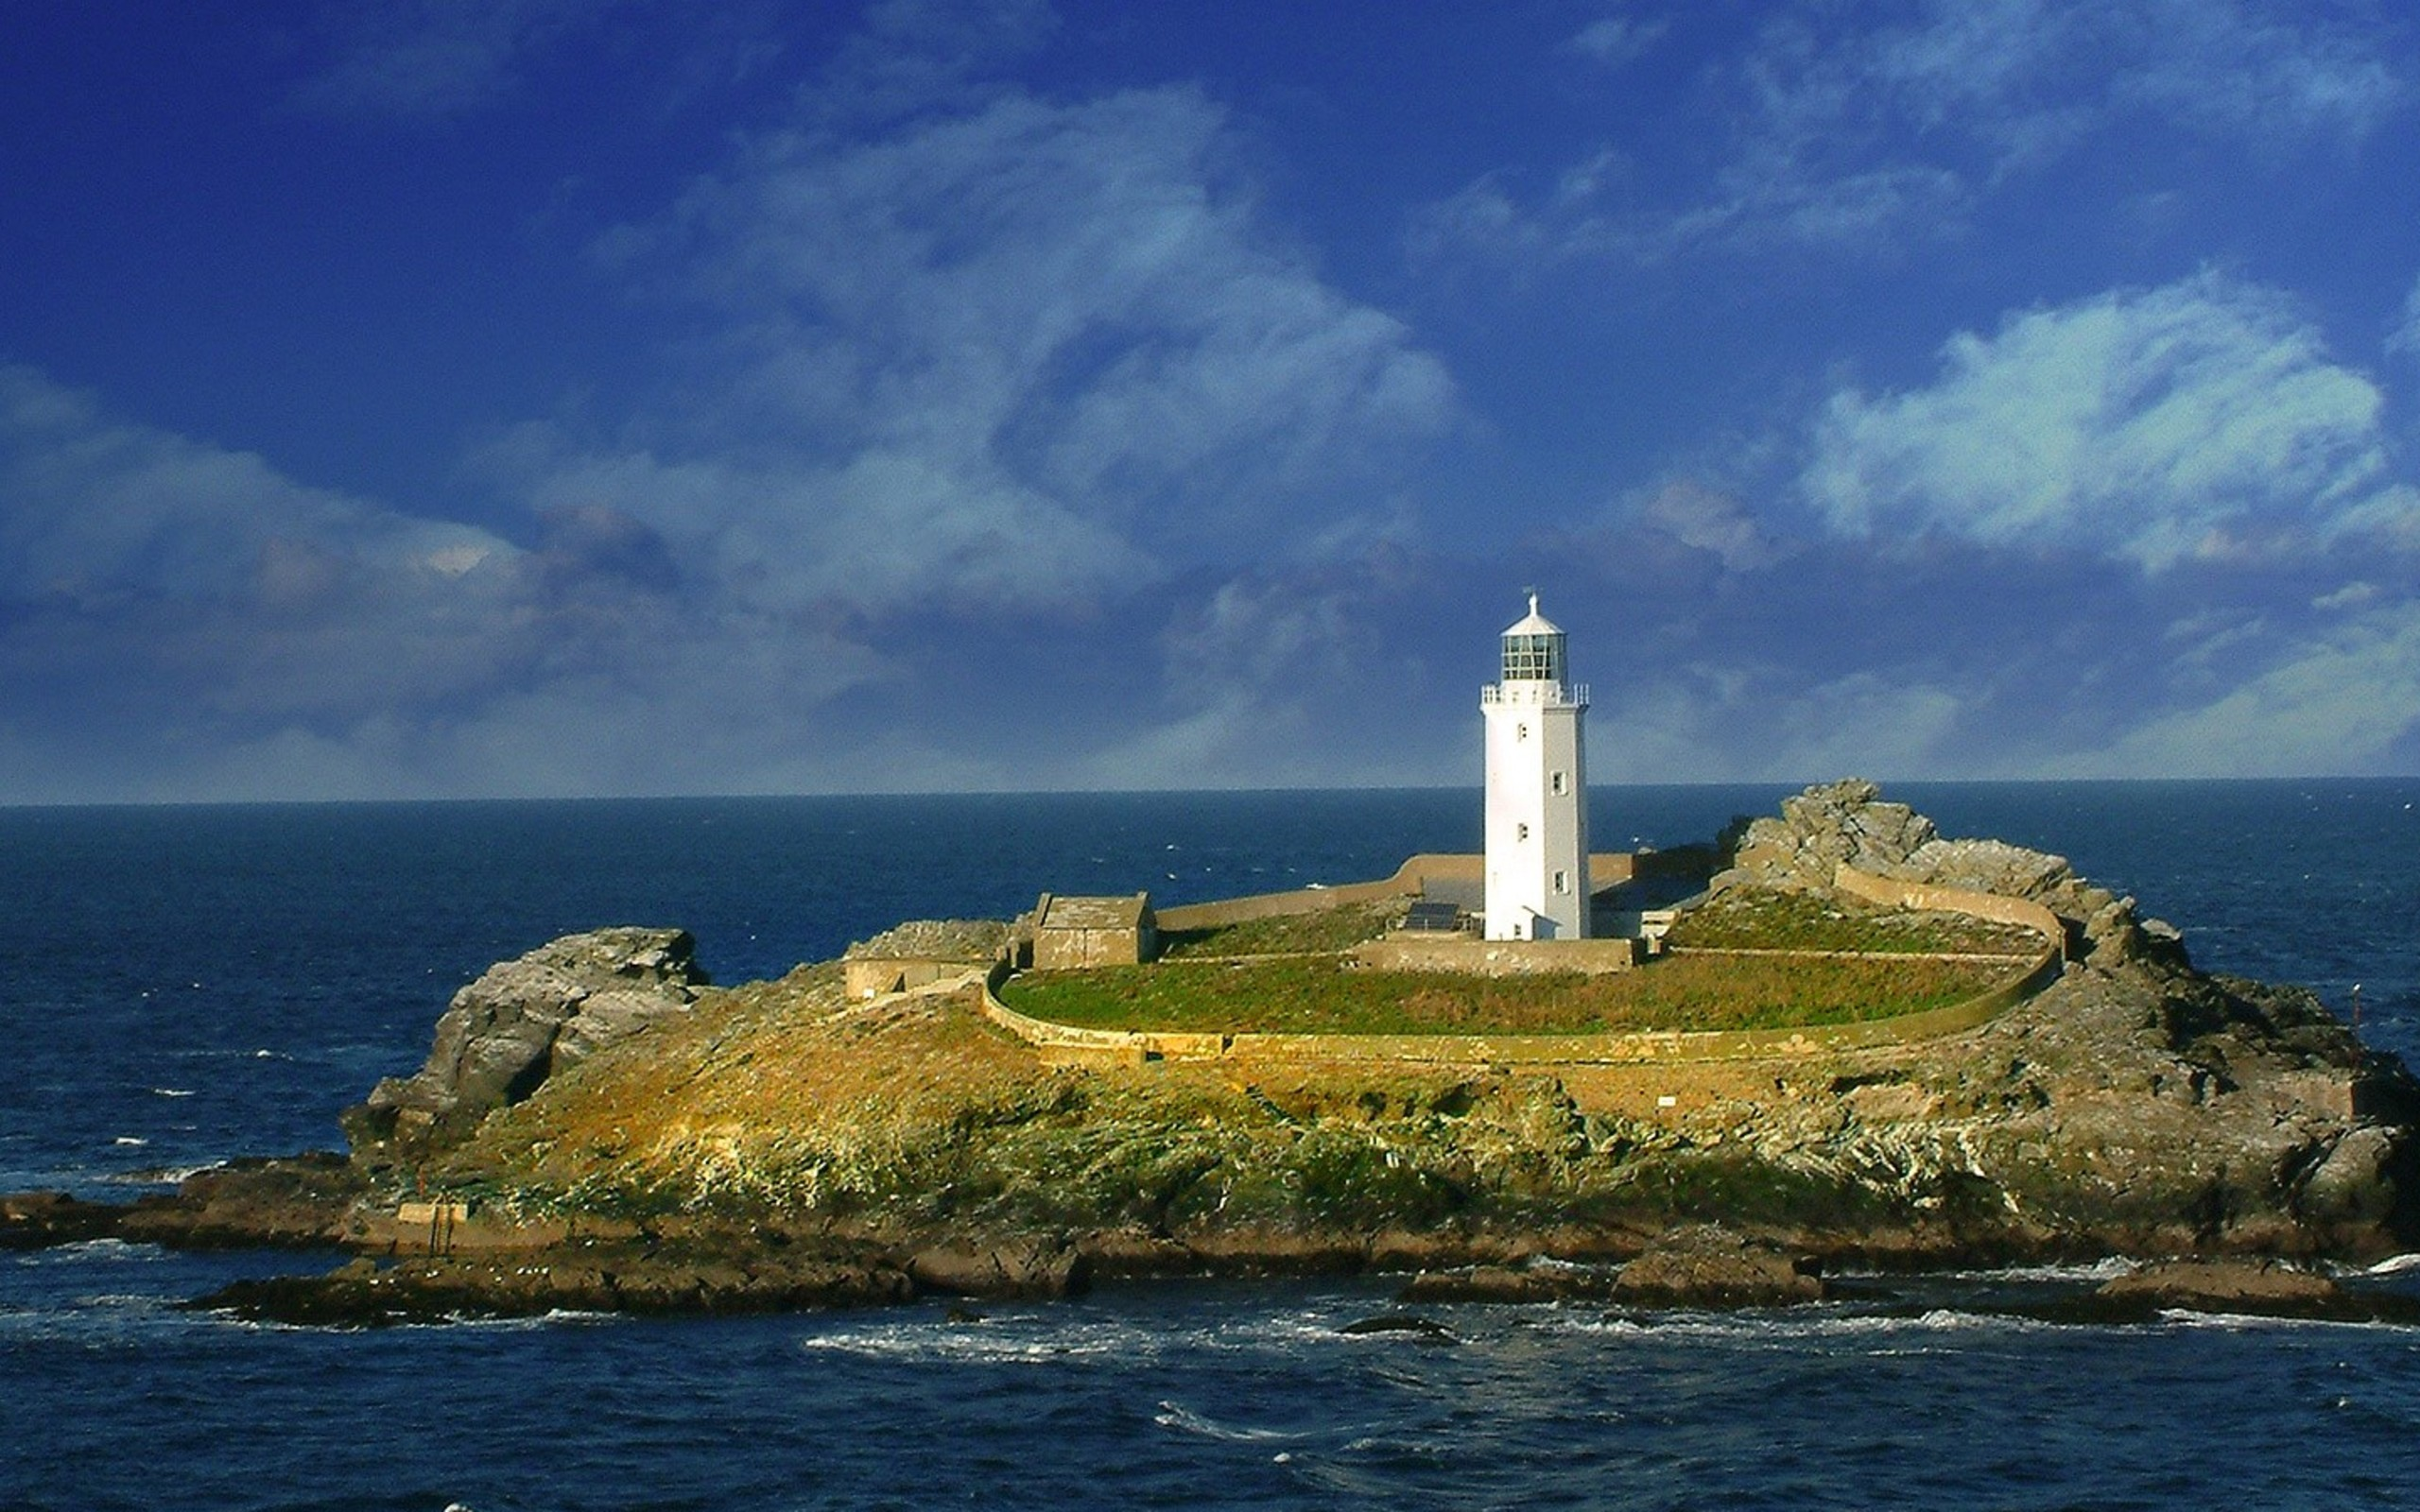 Lighthouse Hd Wallpapers: Windows 10 Lighthouse Wallpaper